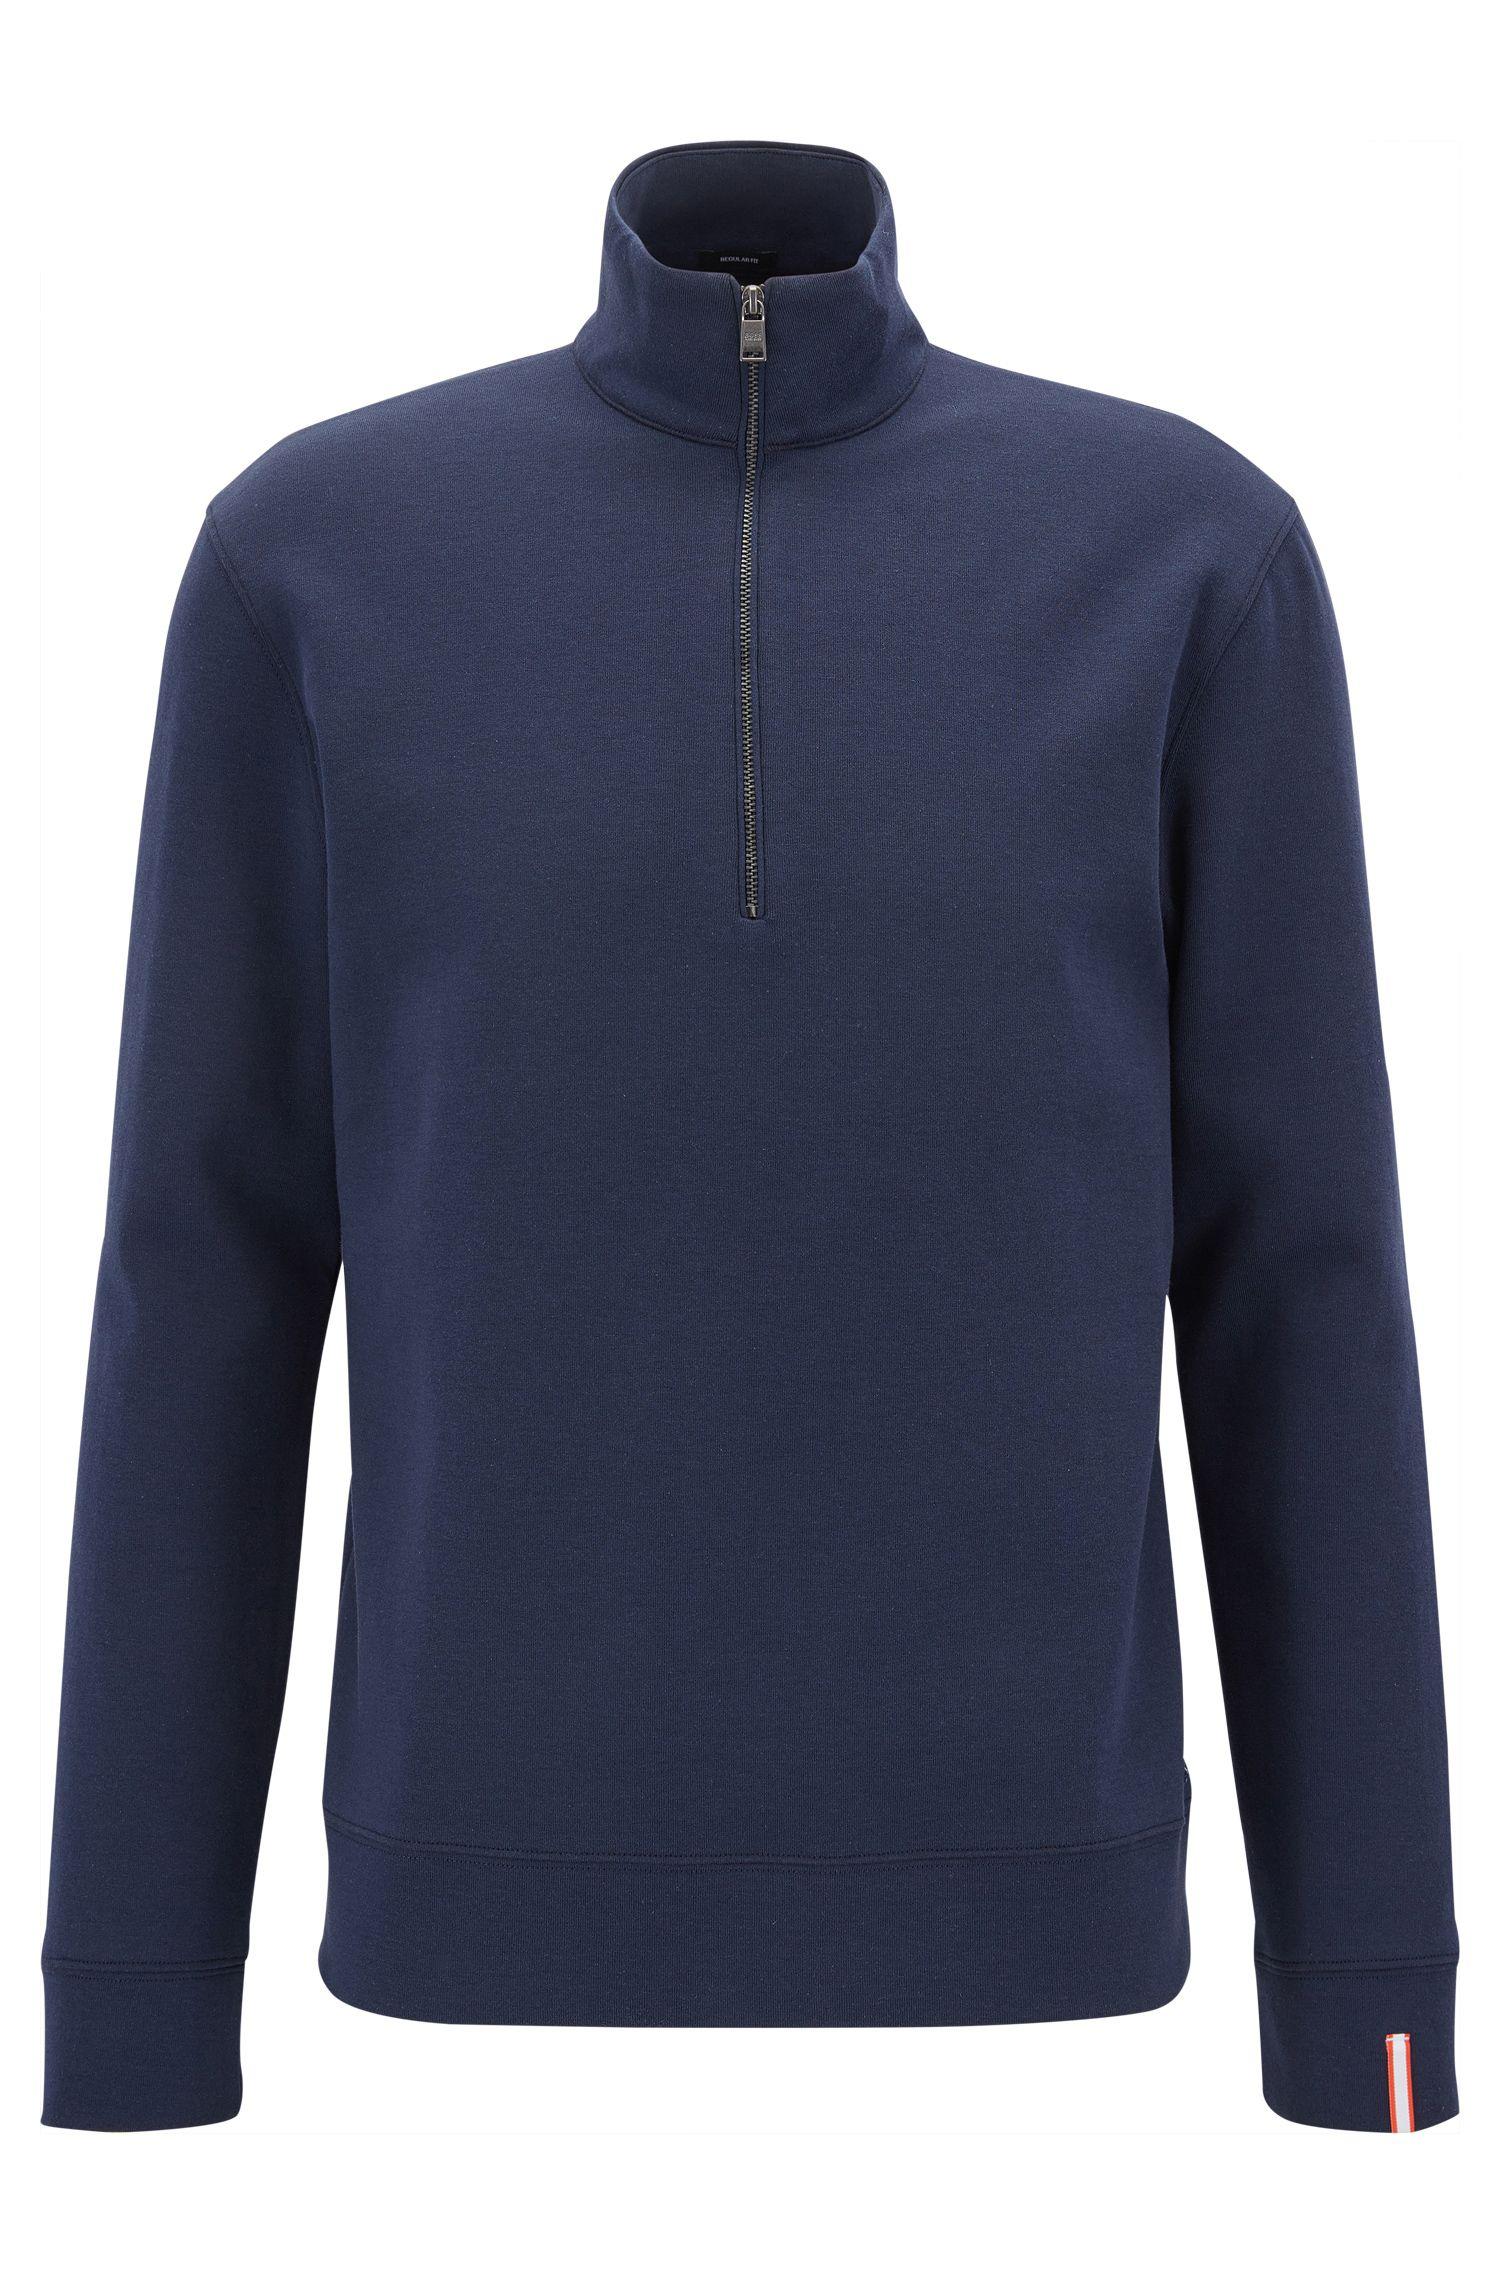 Zip-neck sweatshirt in a double-face cotton blend